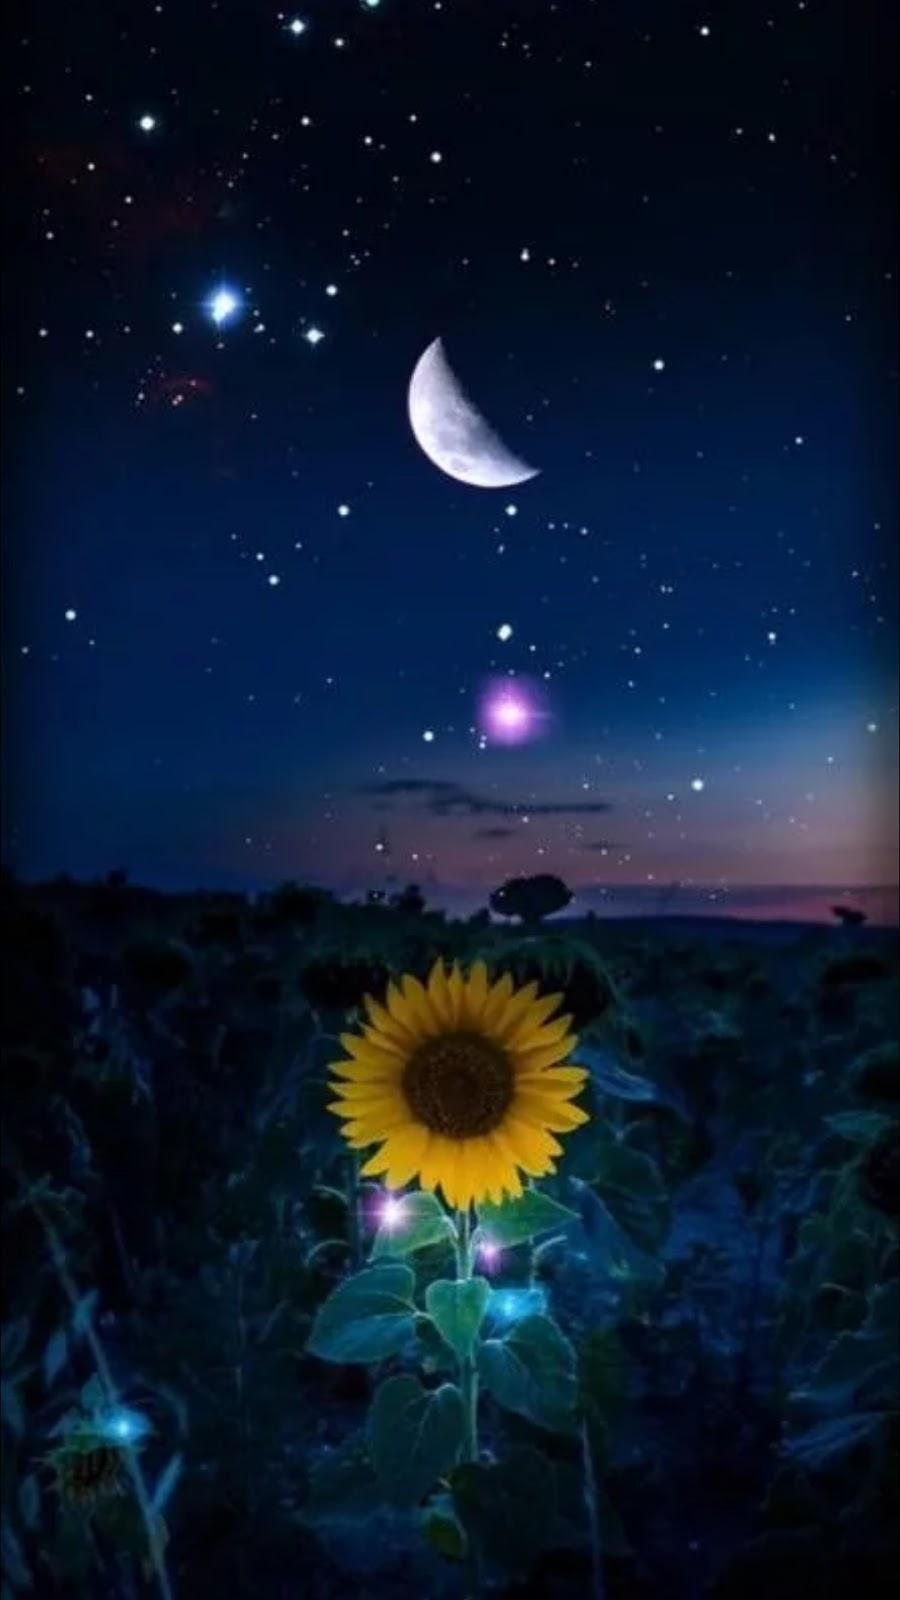 Sunflower under the moon